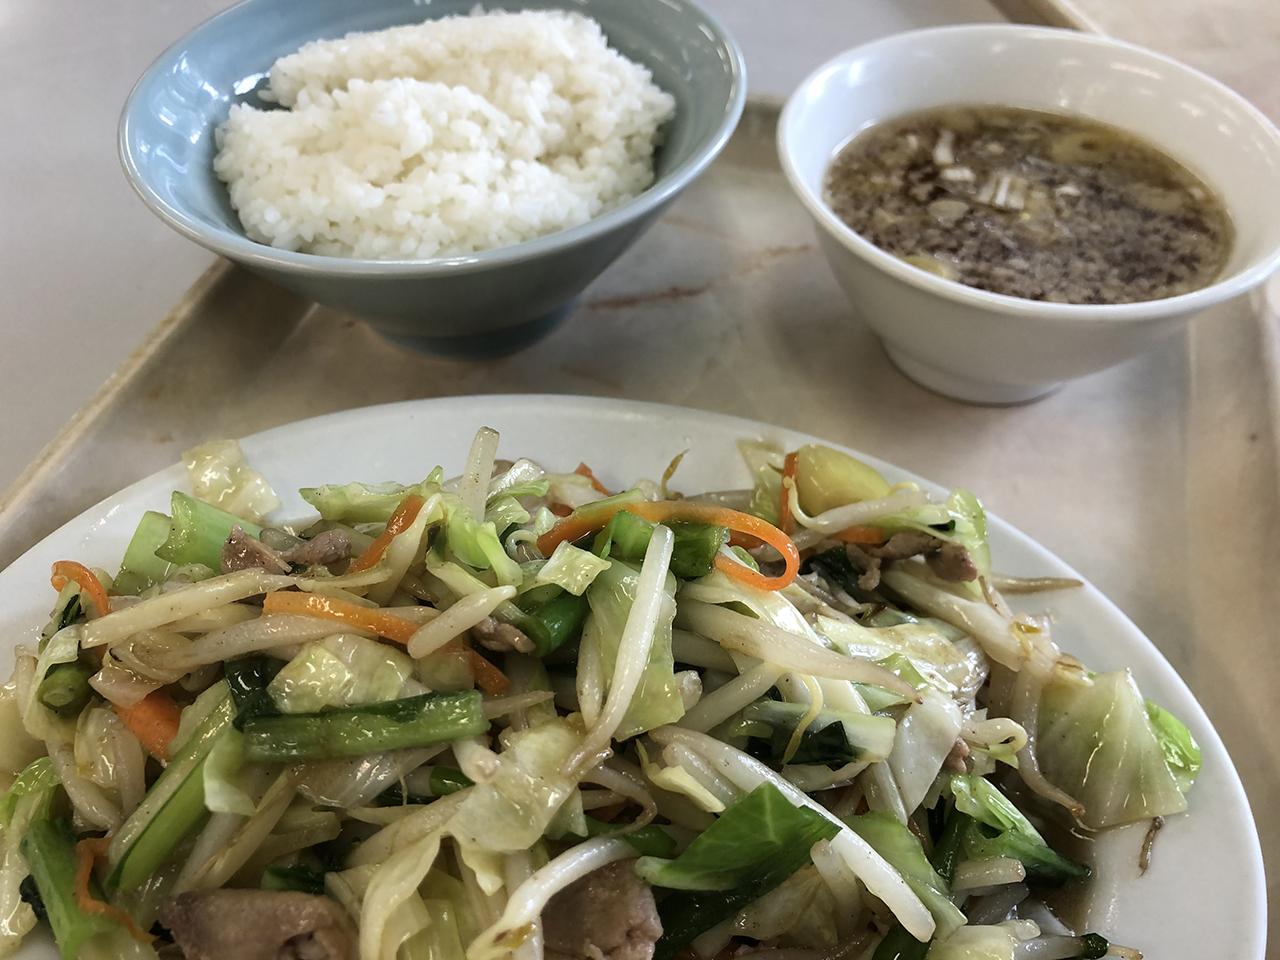 波止場食堂出田町店の肉野菜炒め